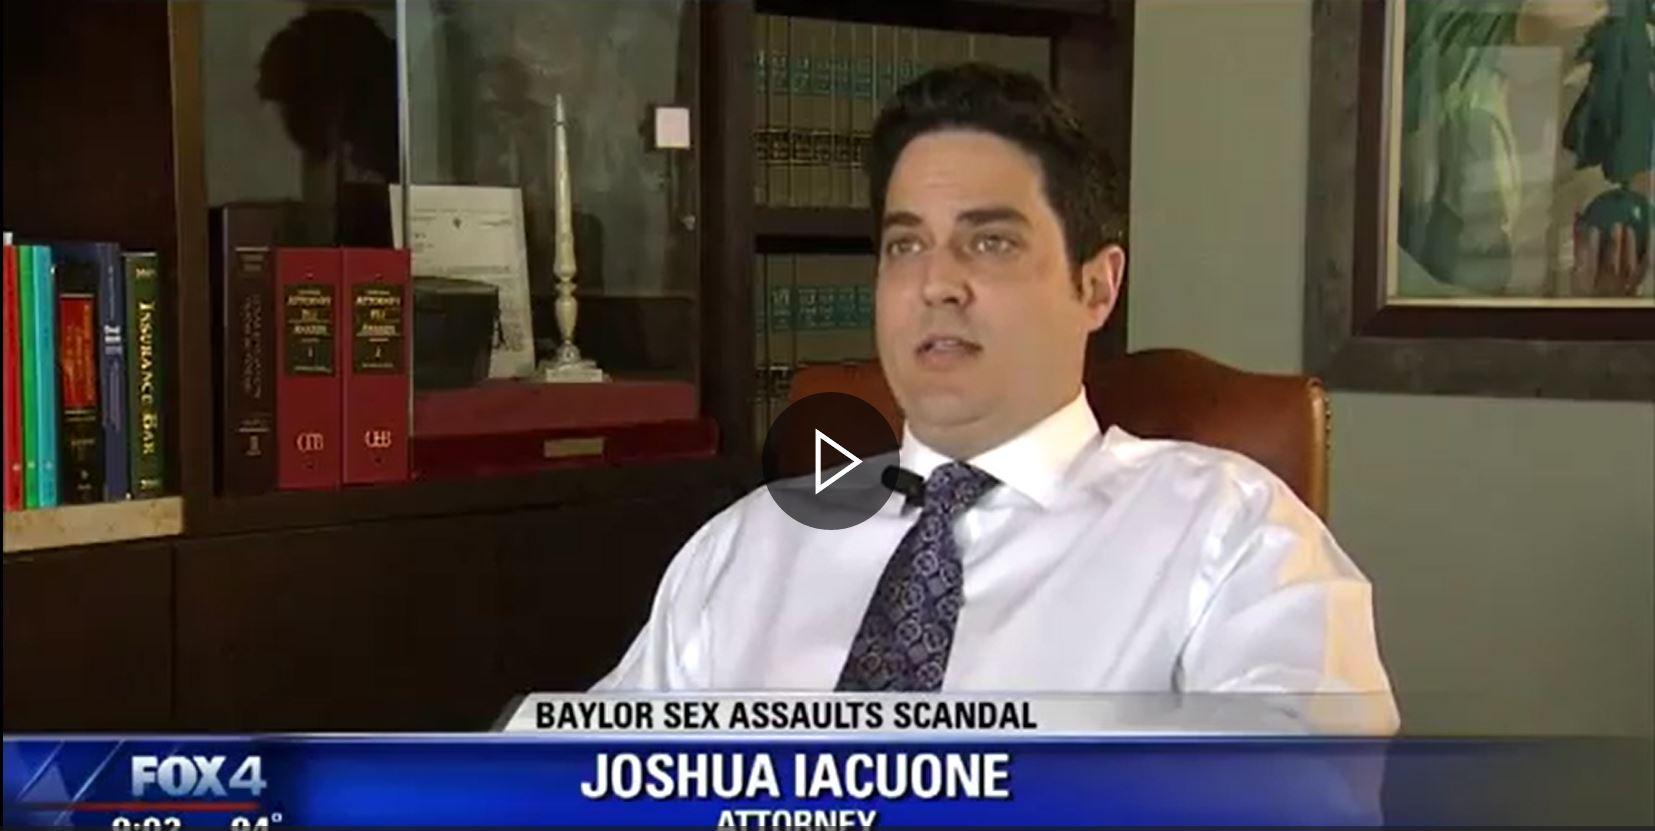 Joshua Iacuone interview on Fox4 News | Baylor Sex Assaults